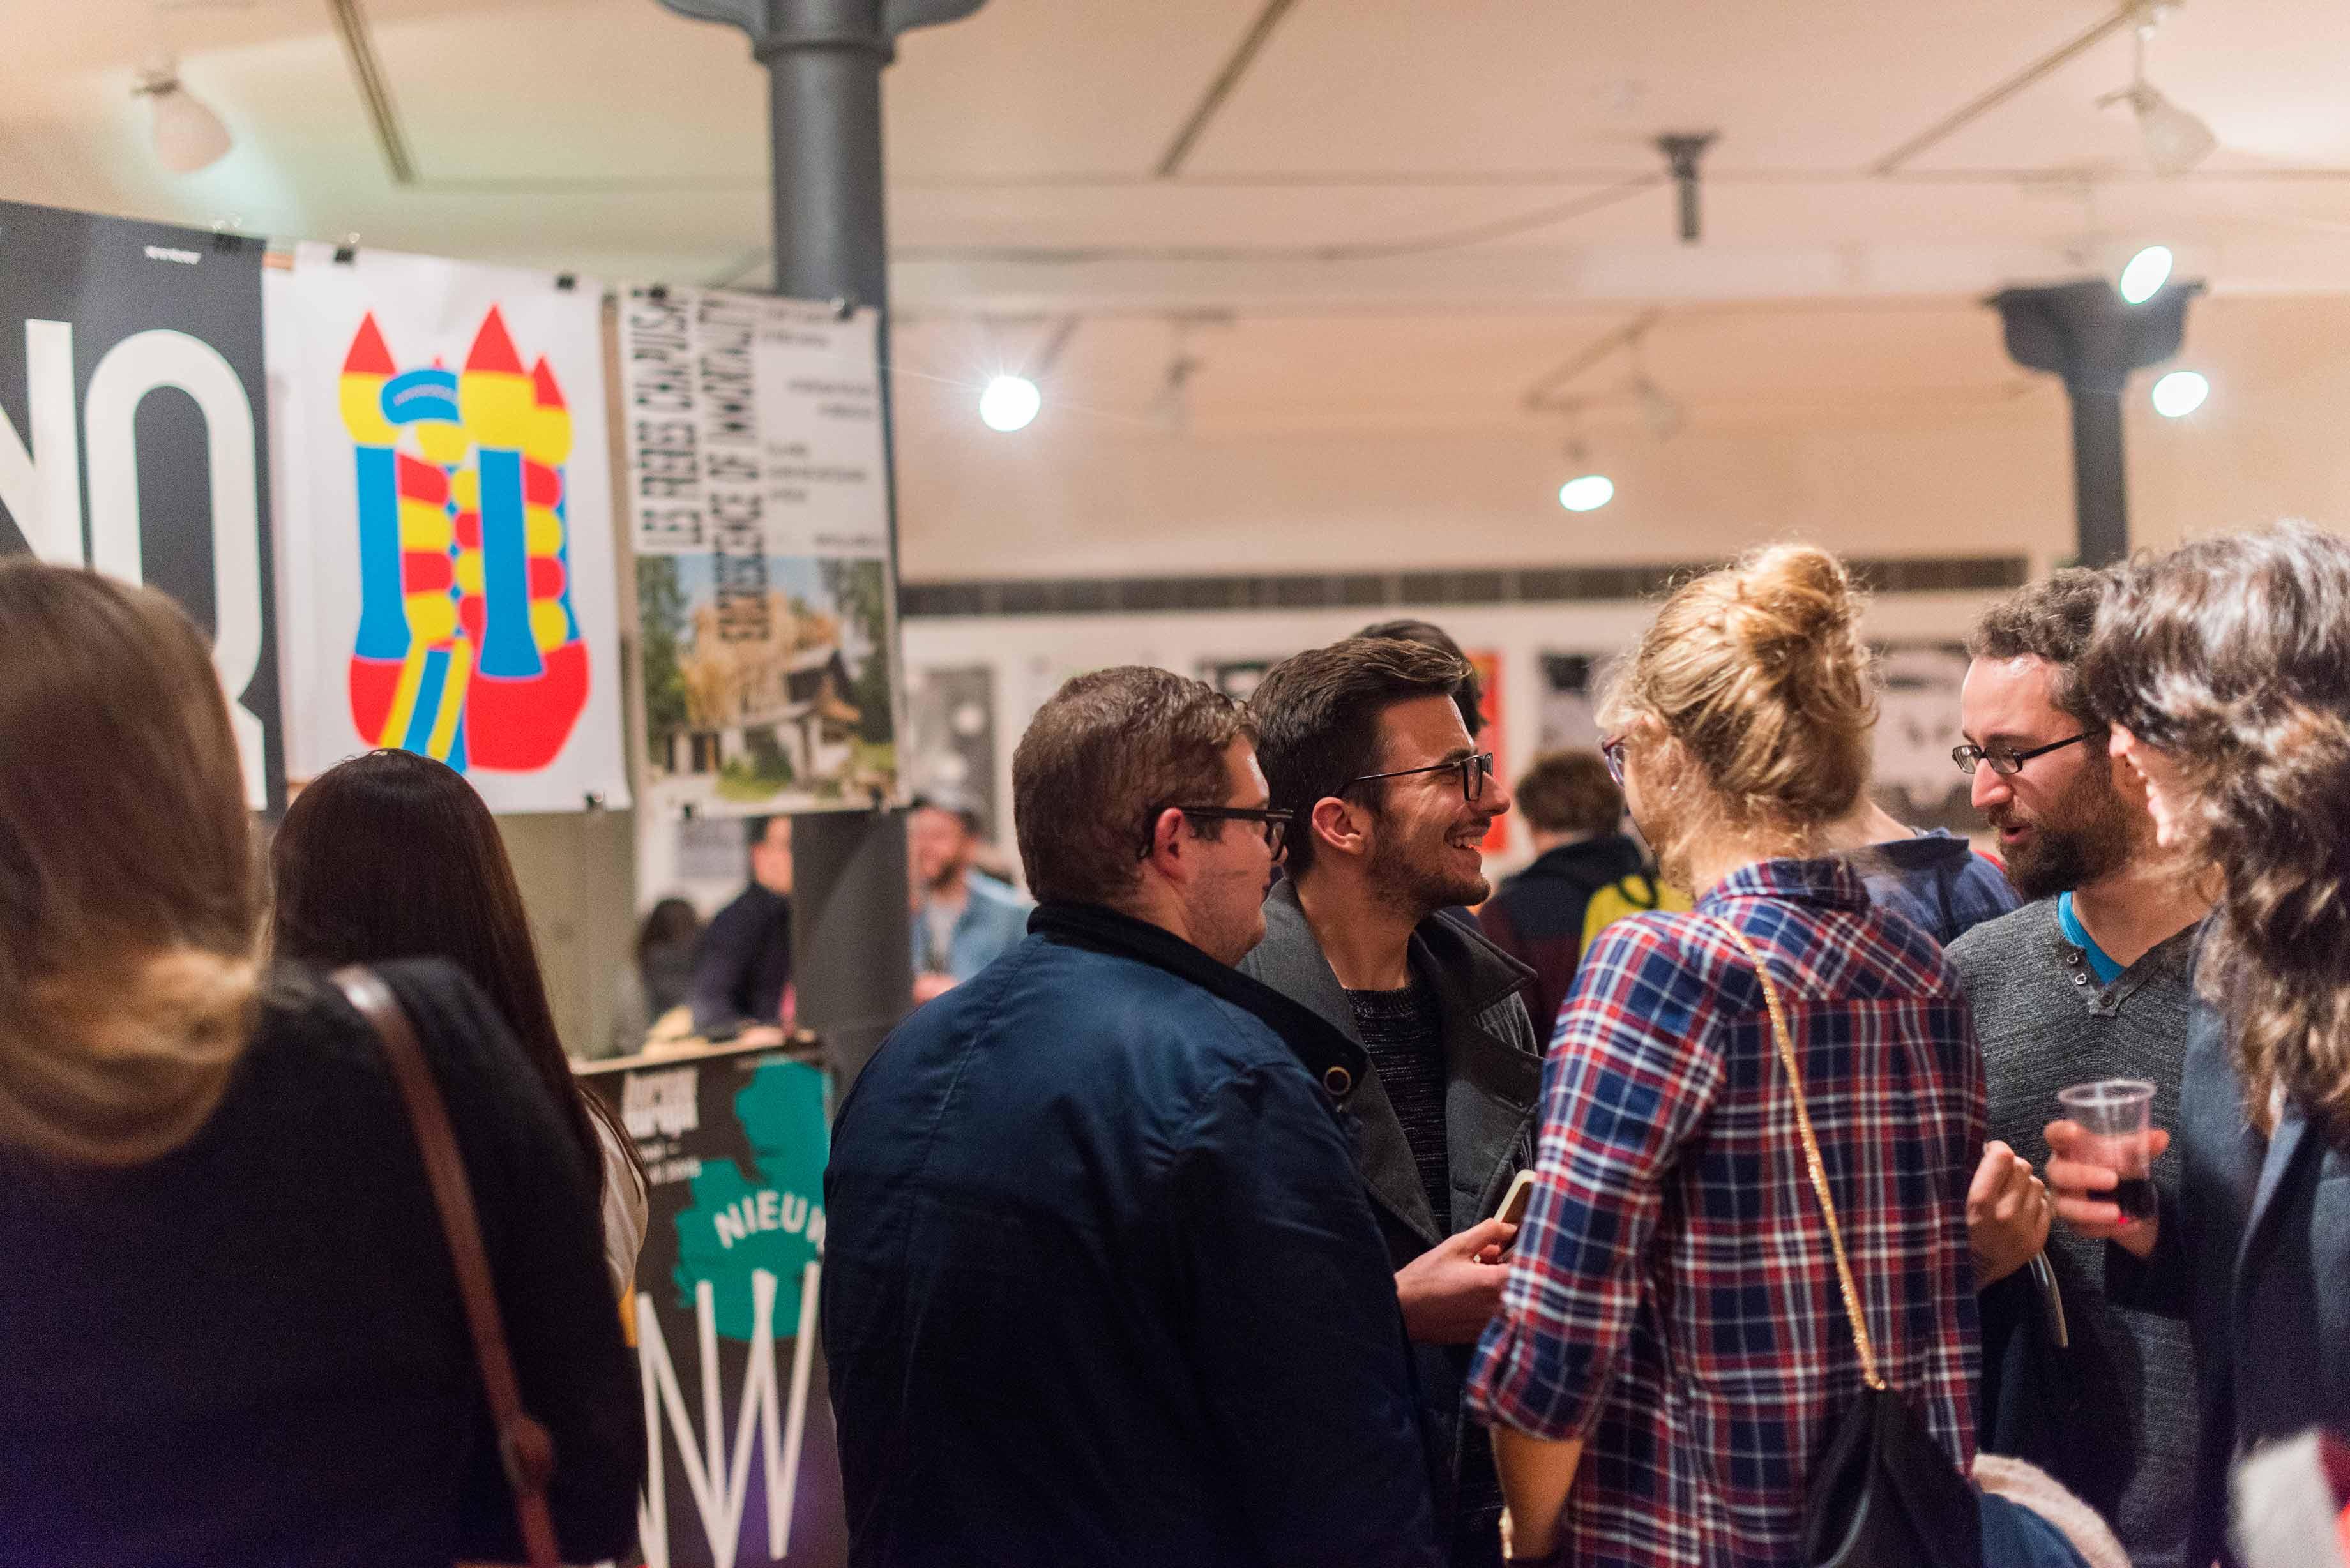 14graphicdesignfestivalscotland-2015-launch